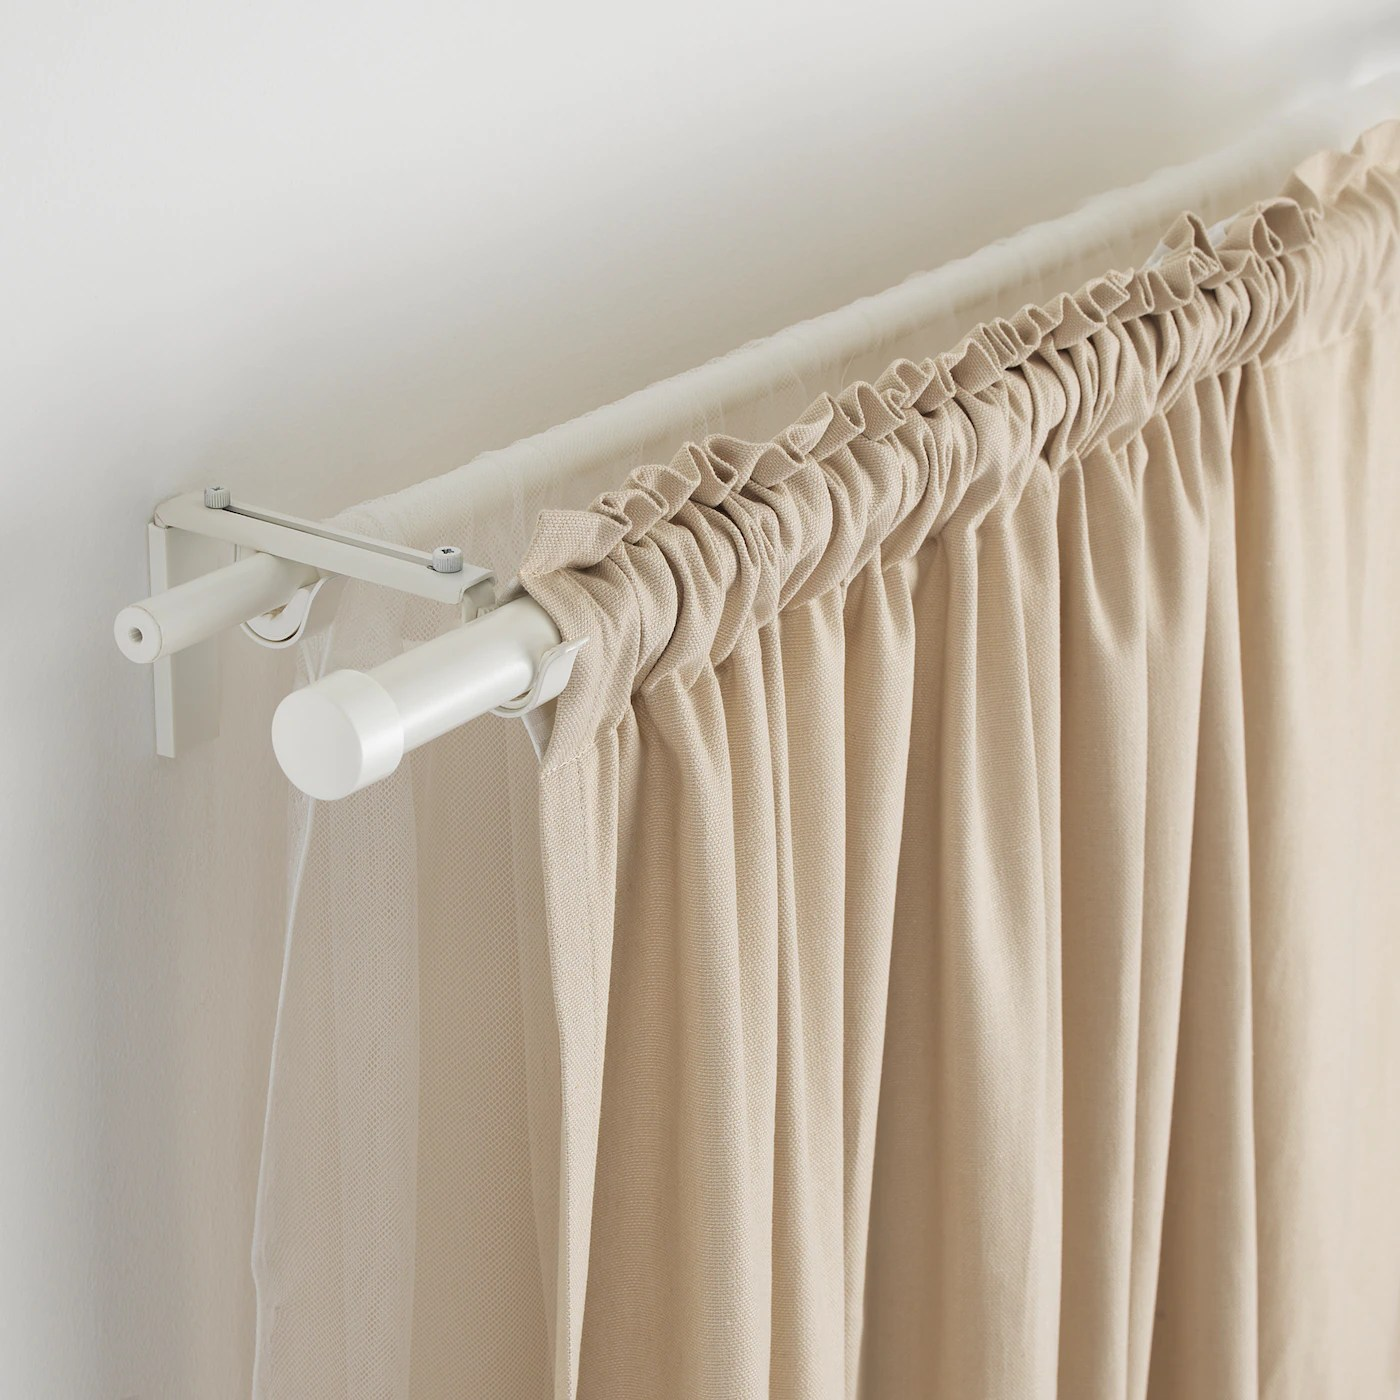 hugad curtain rod white 83 152